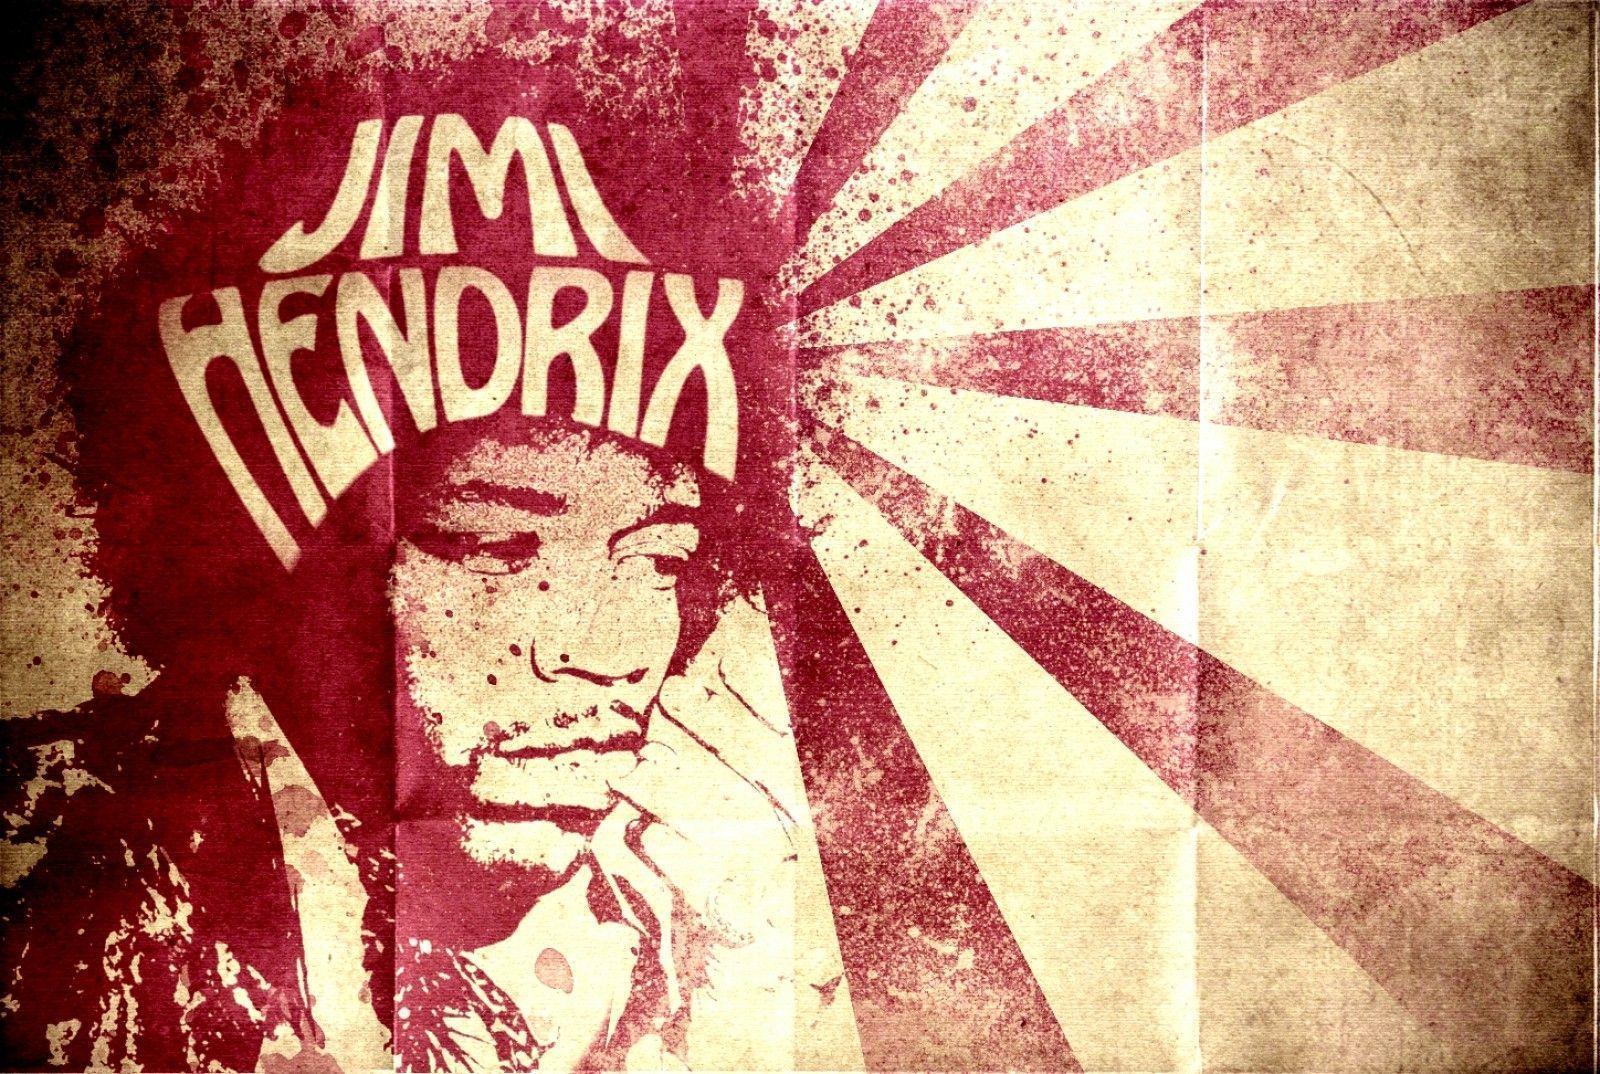 jimi hendrix wallpaper 10 - photo #22